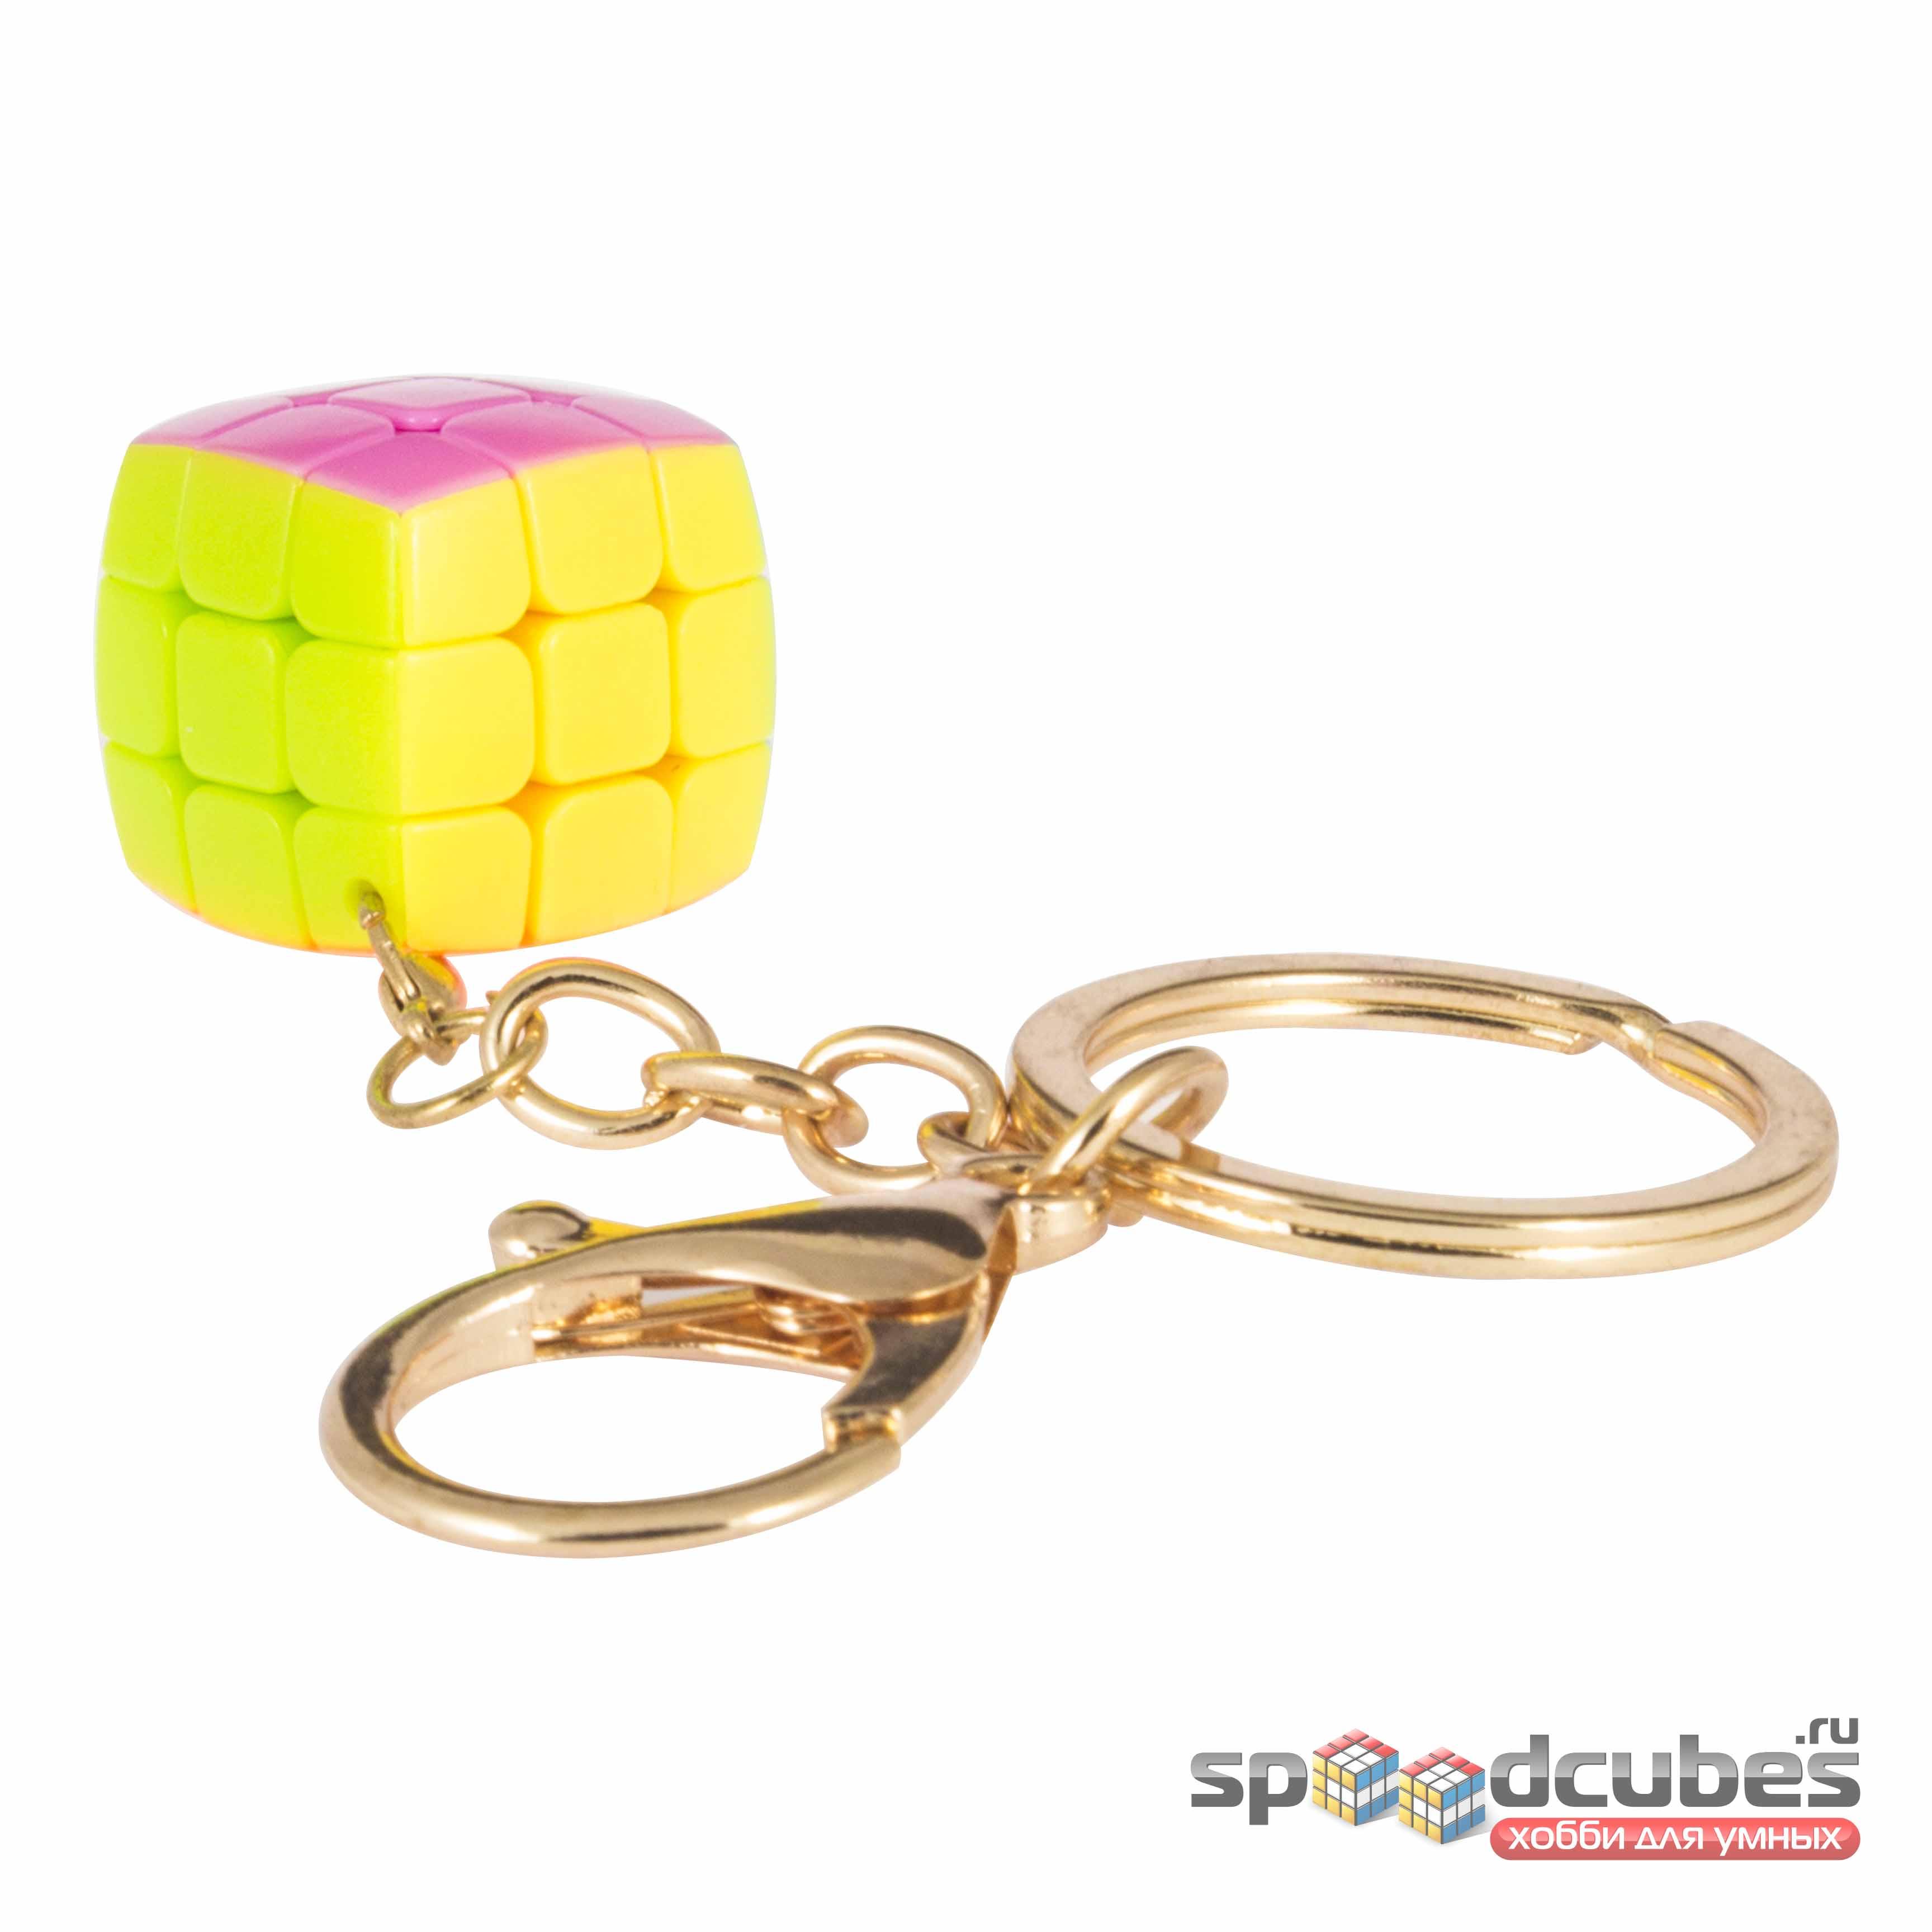 YJ 3x3x3 брелок MiniBread Cube 2.0 см 2